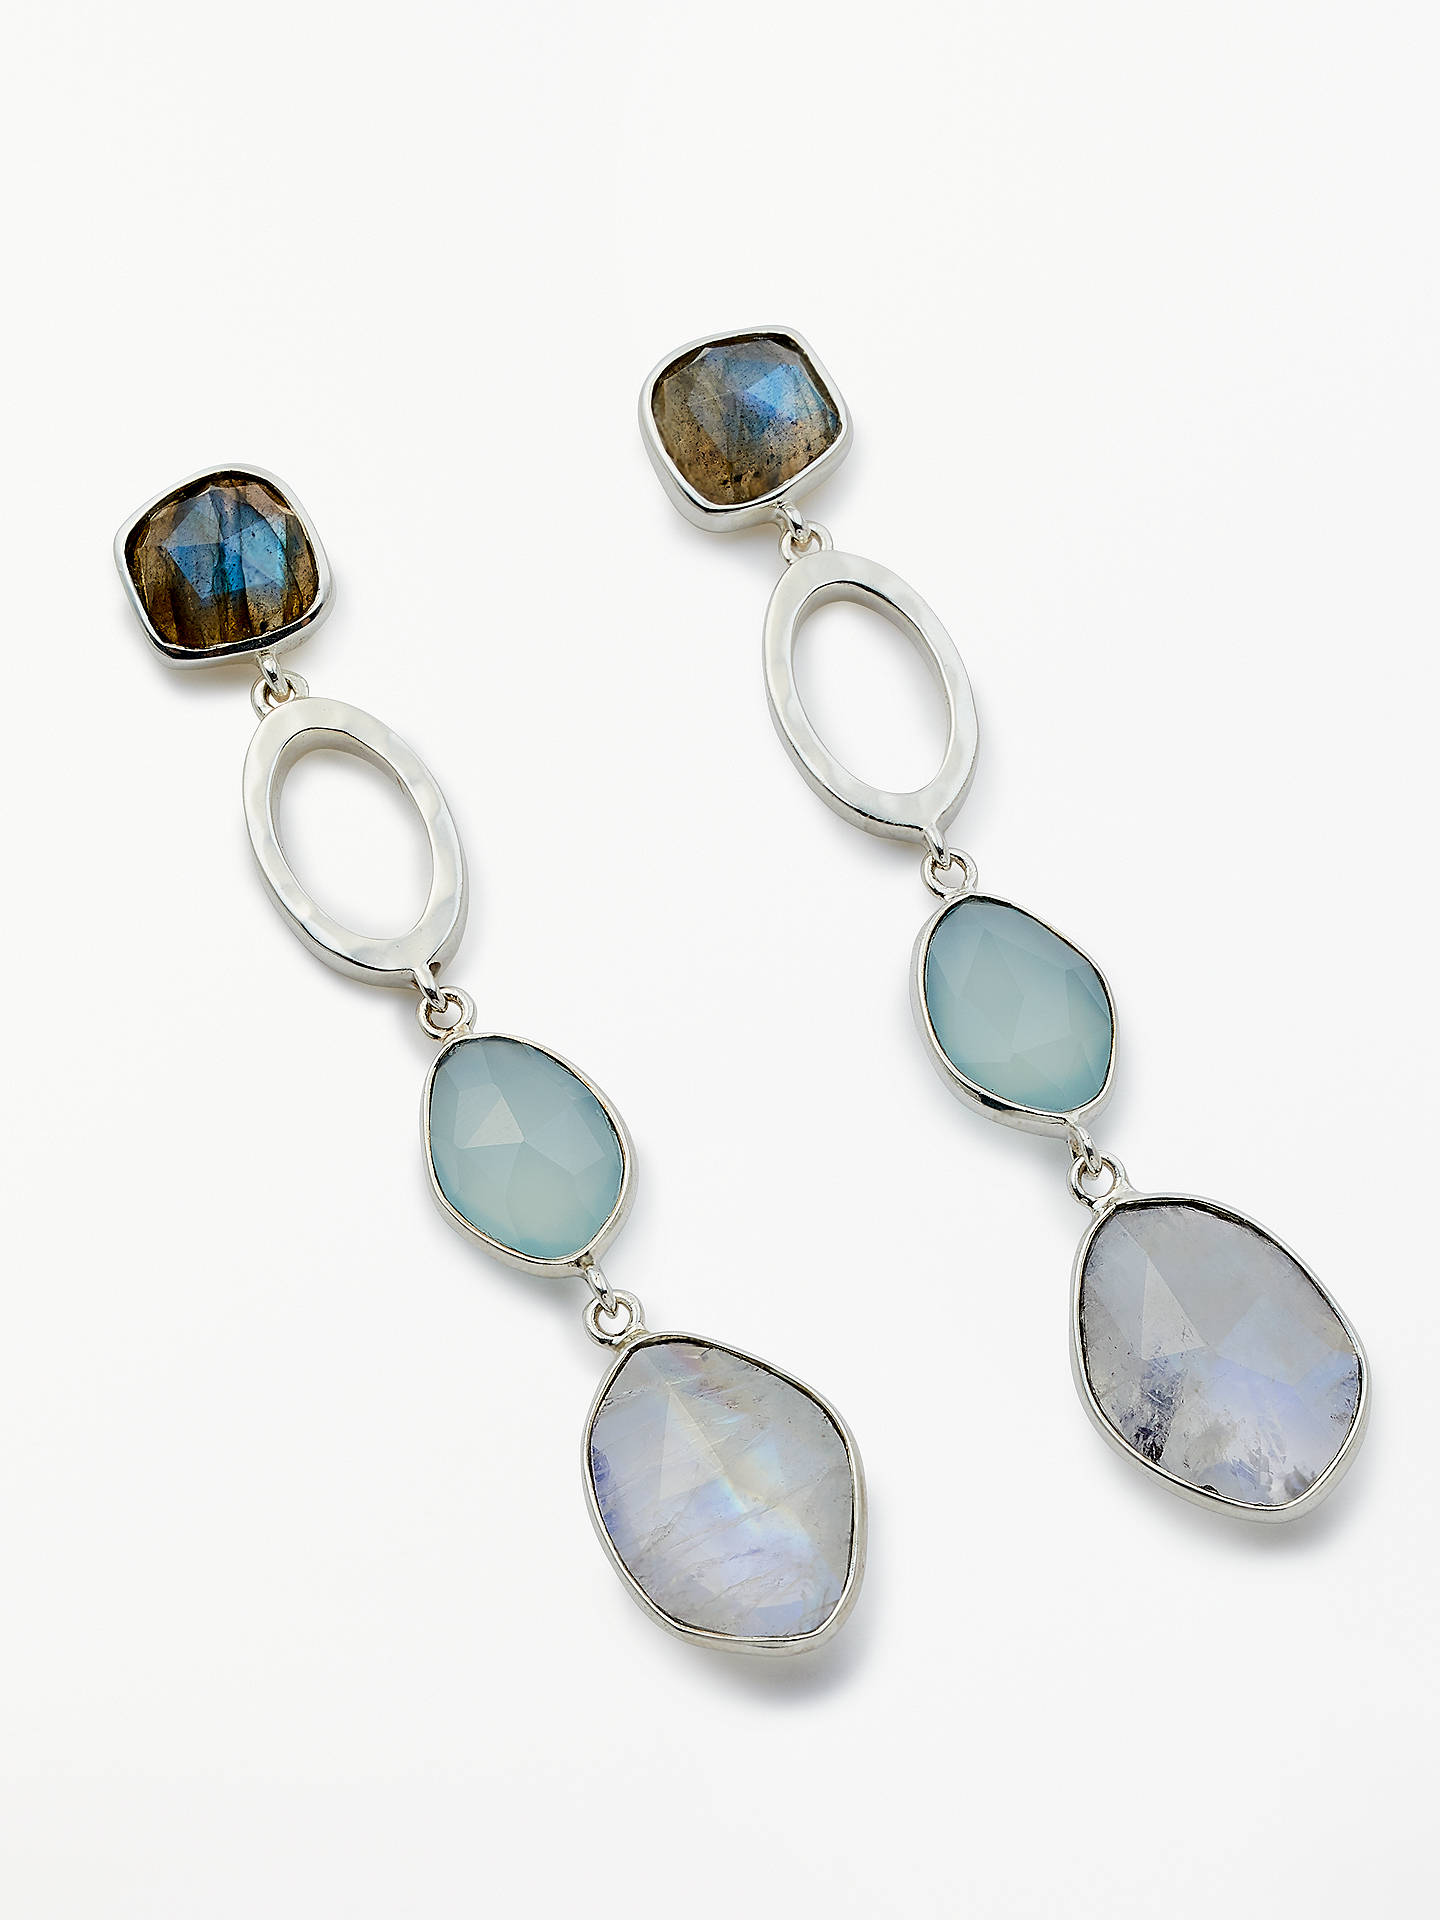 82a7651b6808 Buy John Lewis & Partners Semi-Precious Stone Drop Earrings, Silver Online  at johnlewis ...